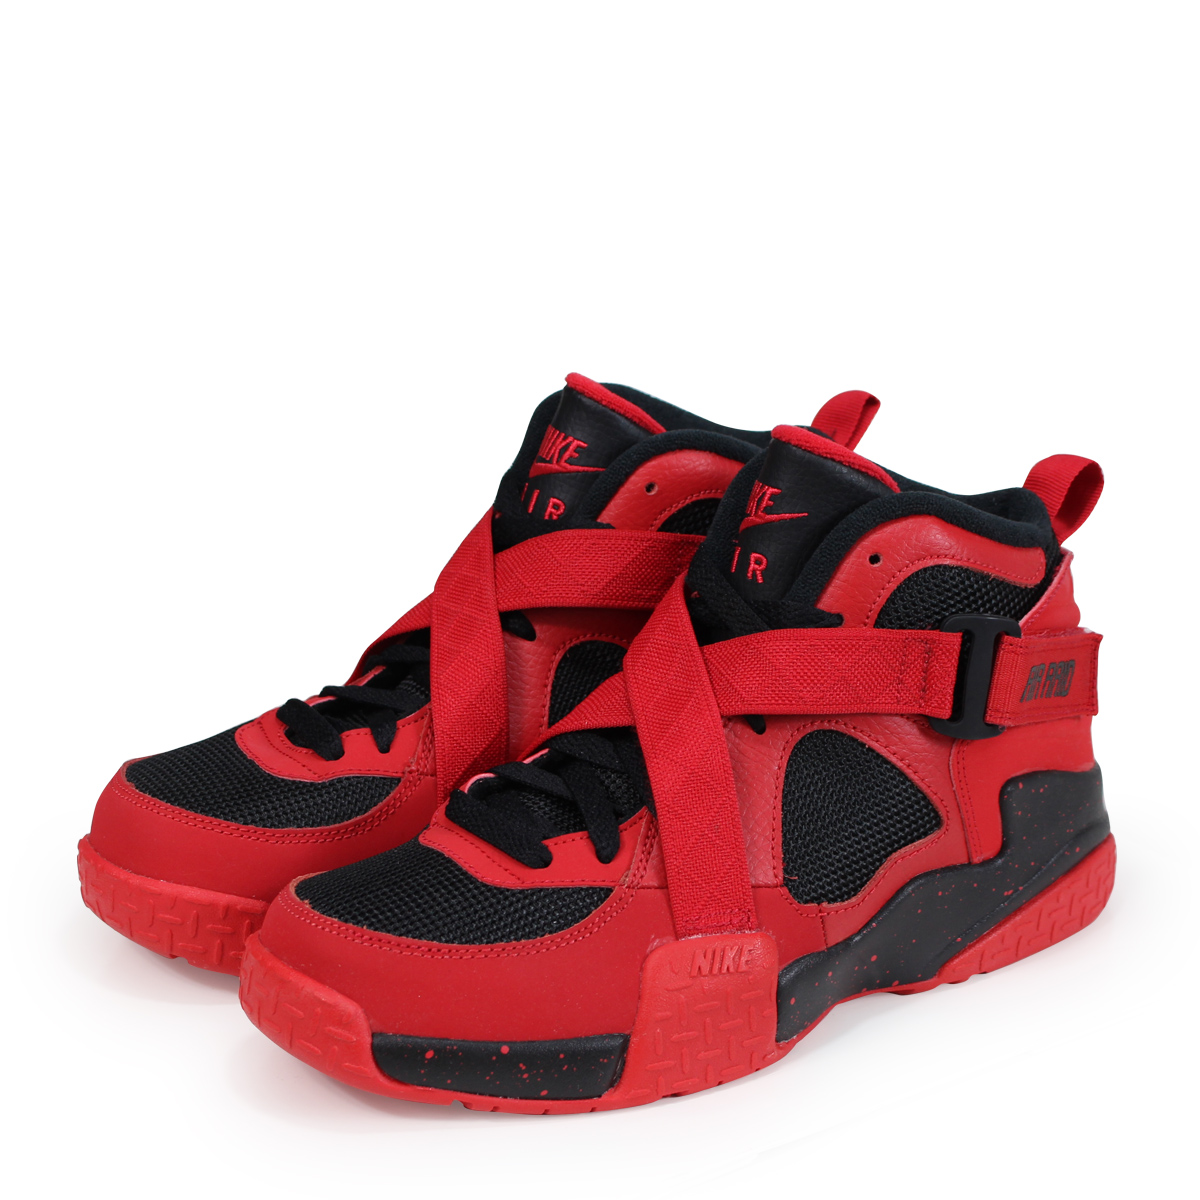 474b55ba7d44 ALLSPORTS  NIKE AIR RAID GS Kie Ney that id Lady s sneakers 644